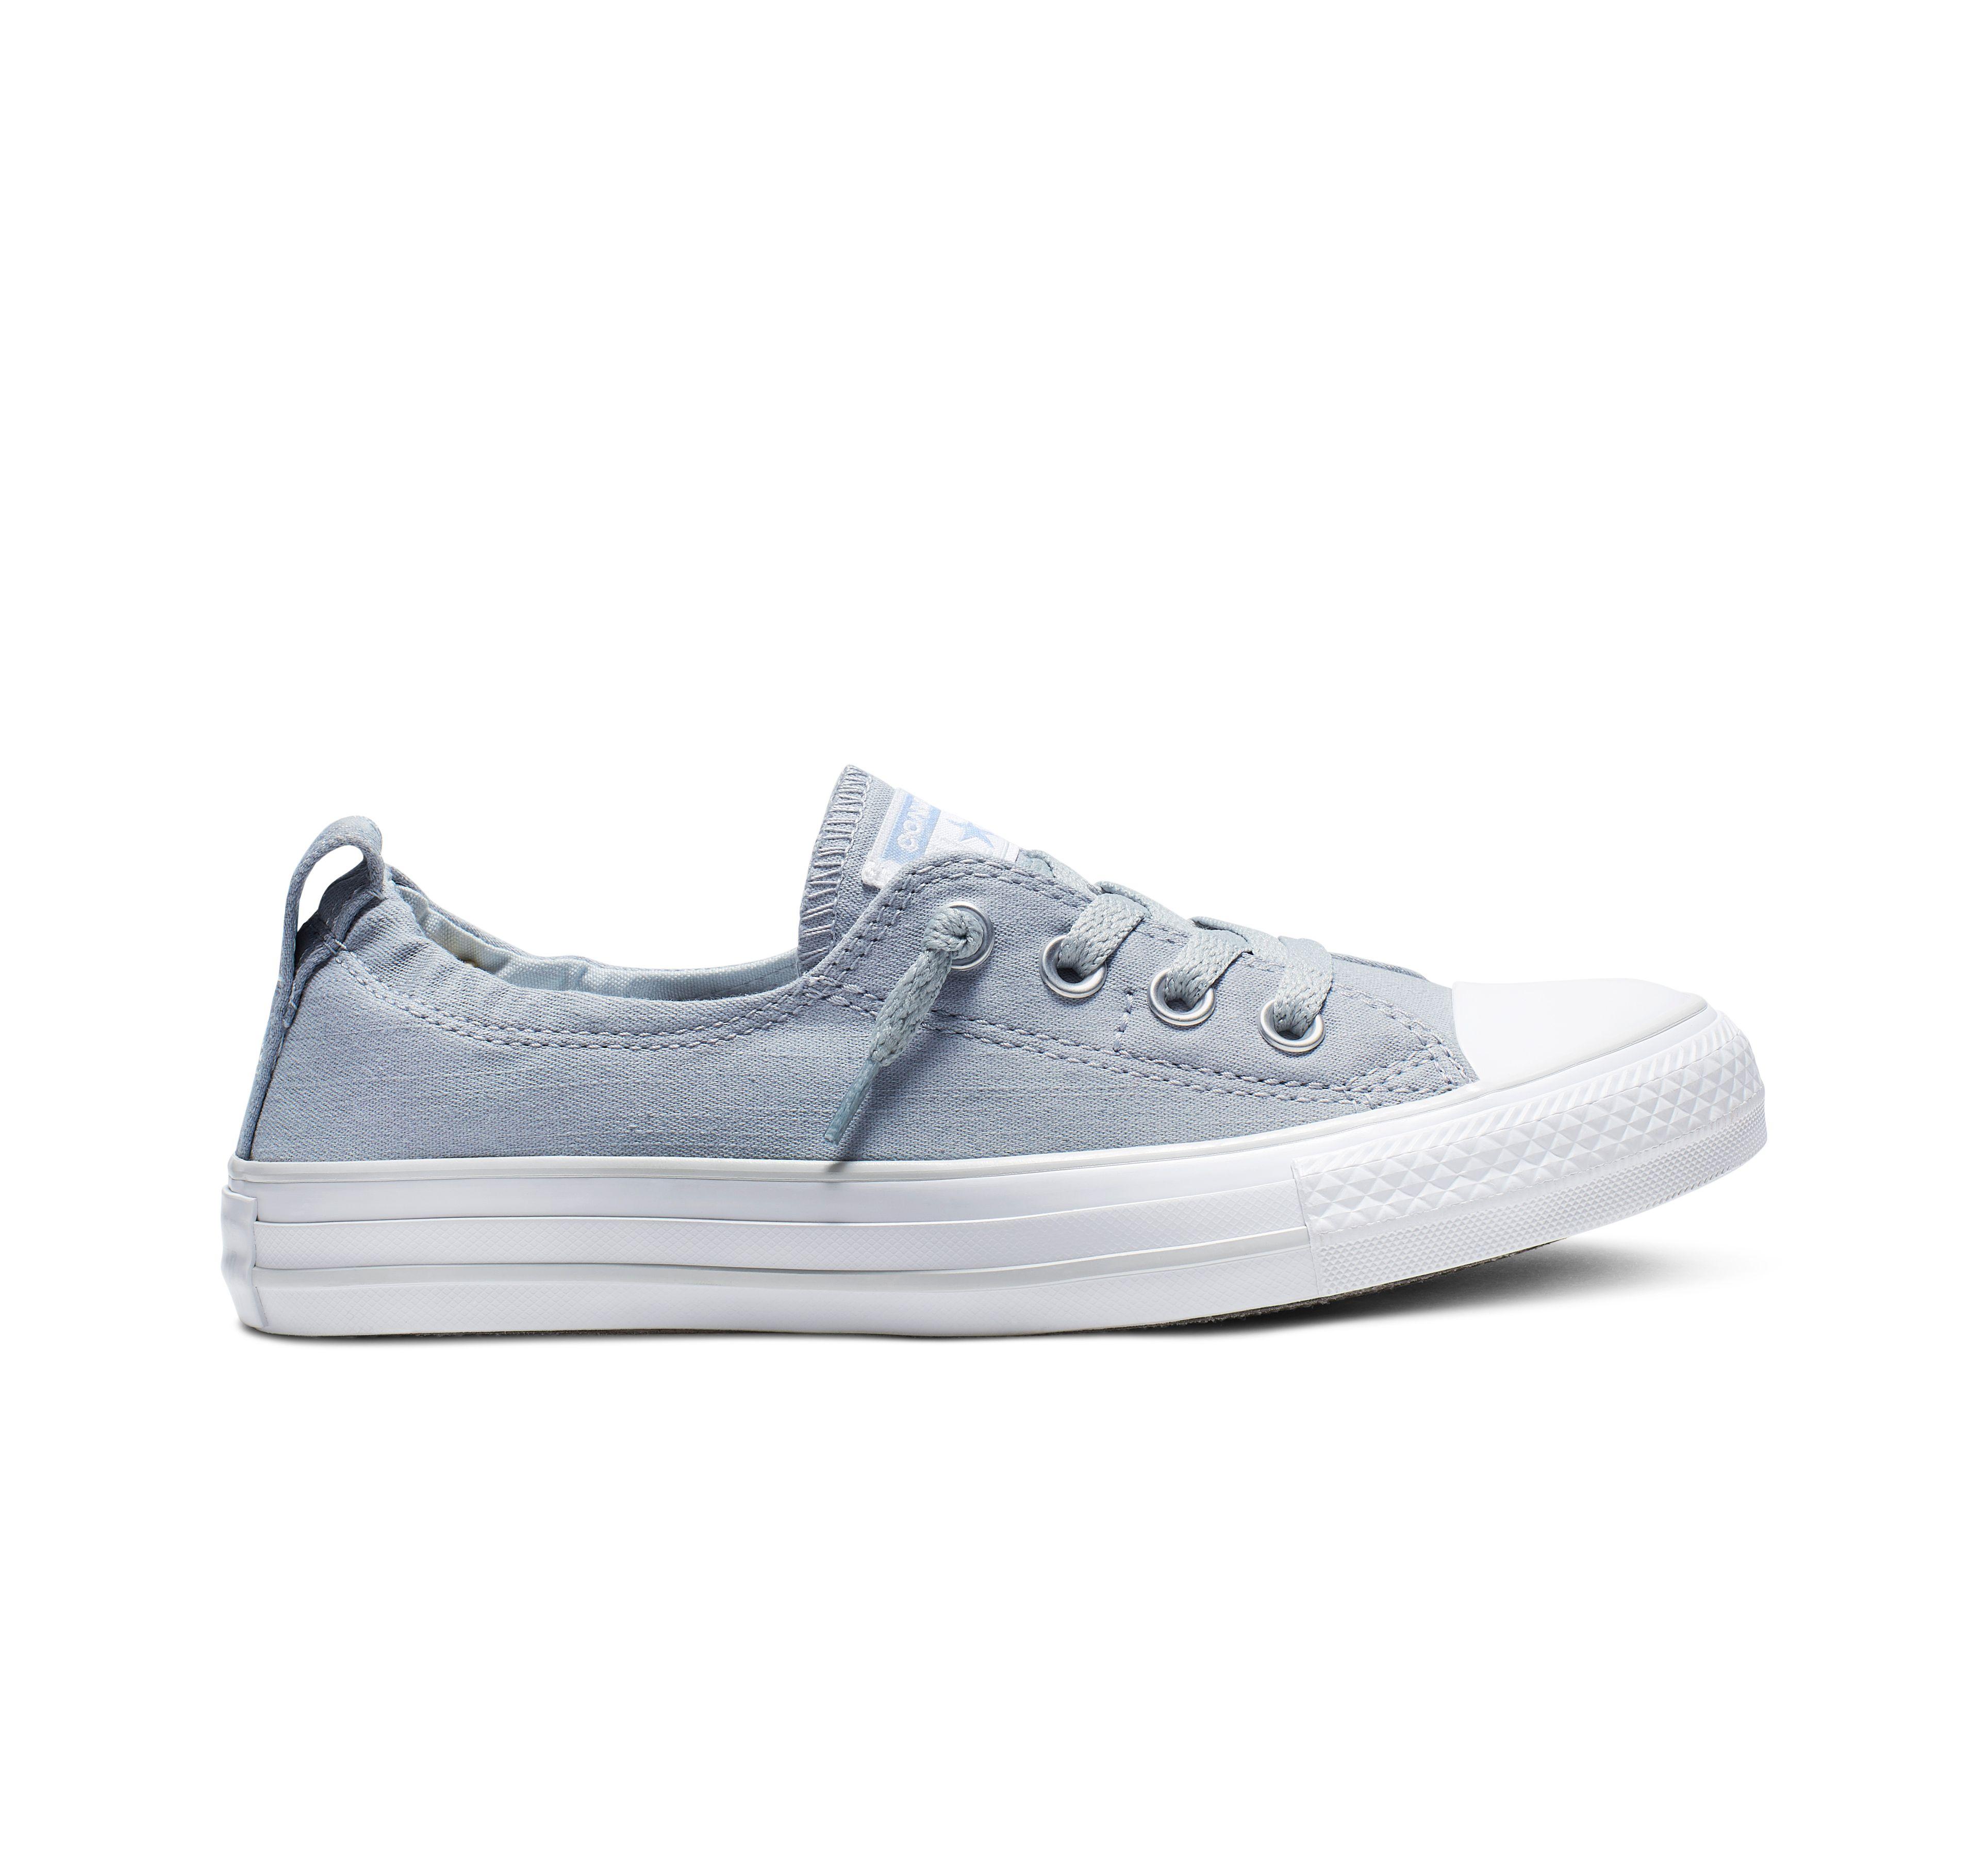 Converse Women's Chuck Taylor All Star Shoreline Slip Sneaker